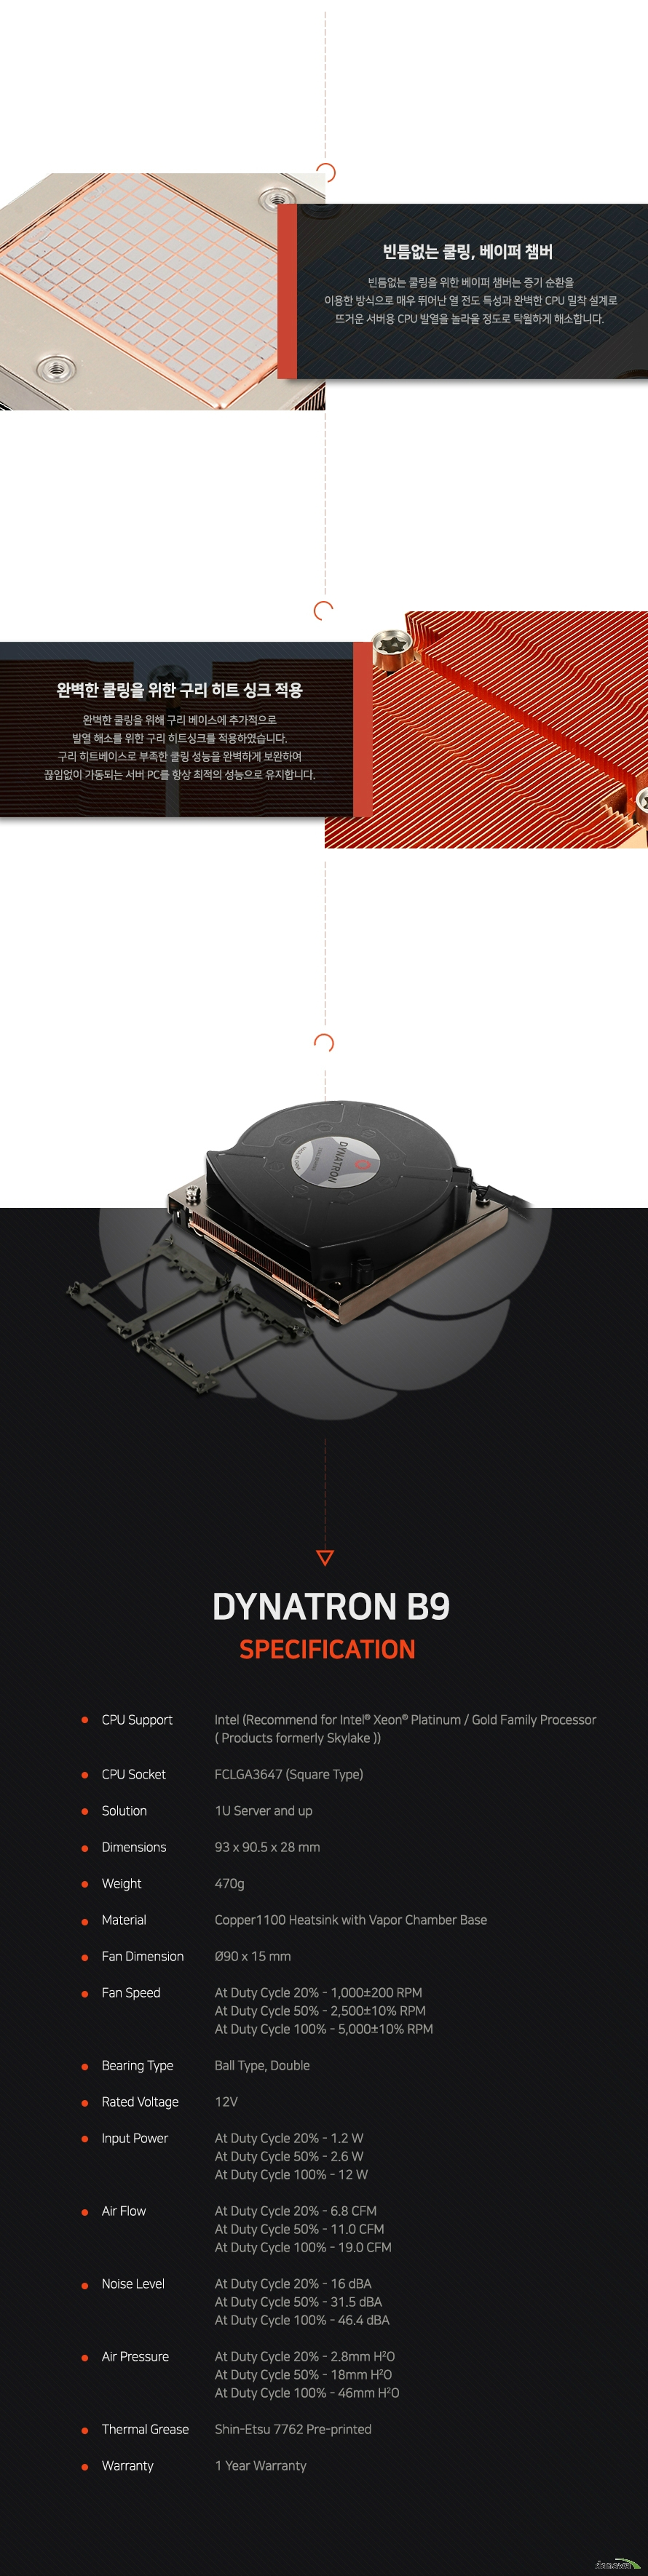 DYNATRON B9